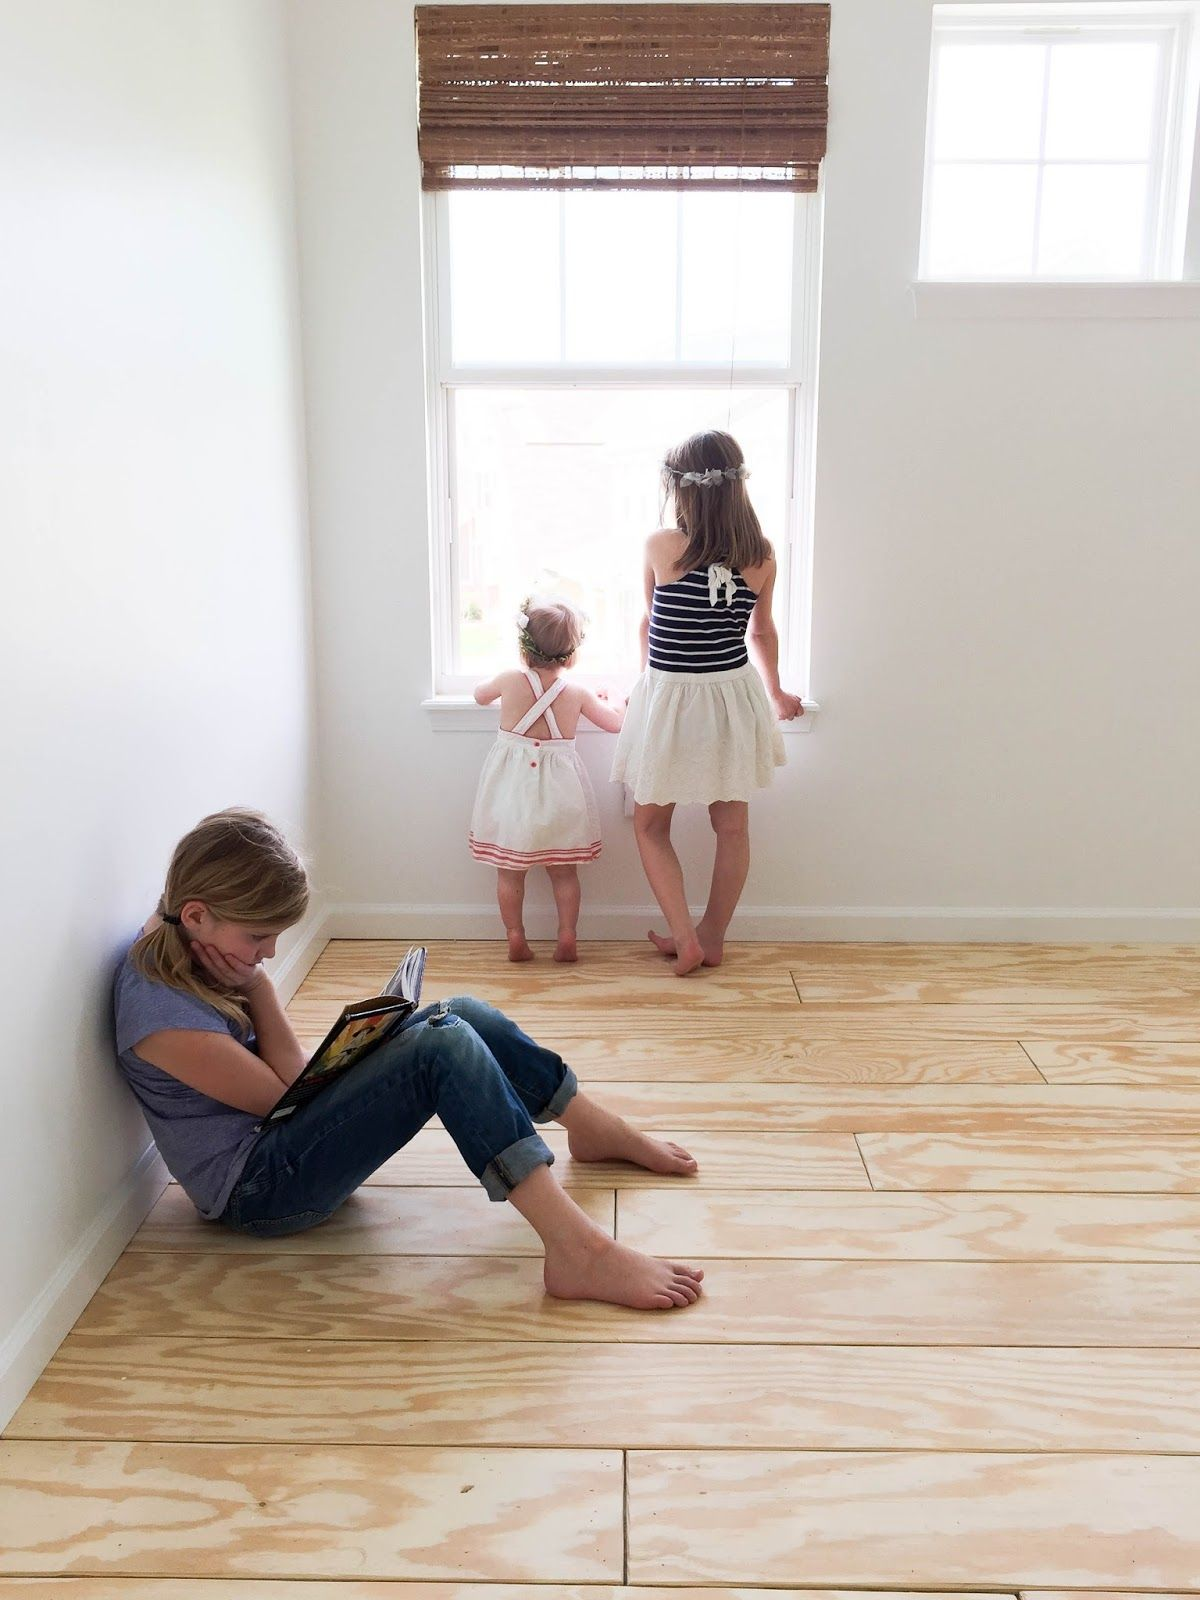 diy plywood planked floors | h o m e | floors | pinterest | plywood